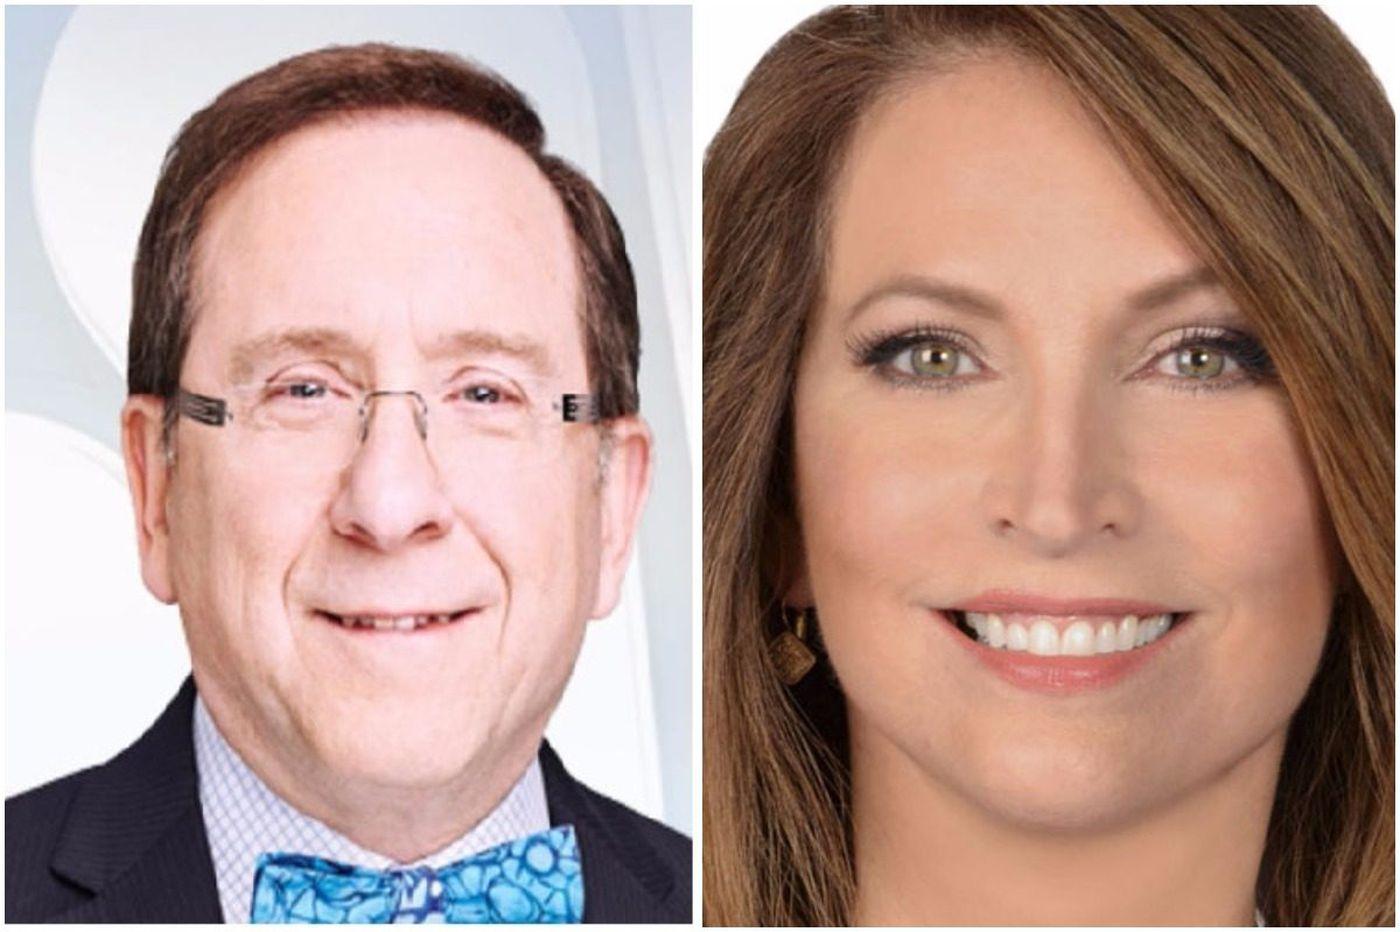 Glenn 'Hurricane' Schwartz's chief meteorologist title shifts to Tammie Souza at NBC10